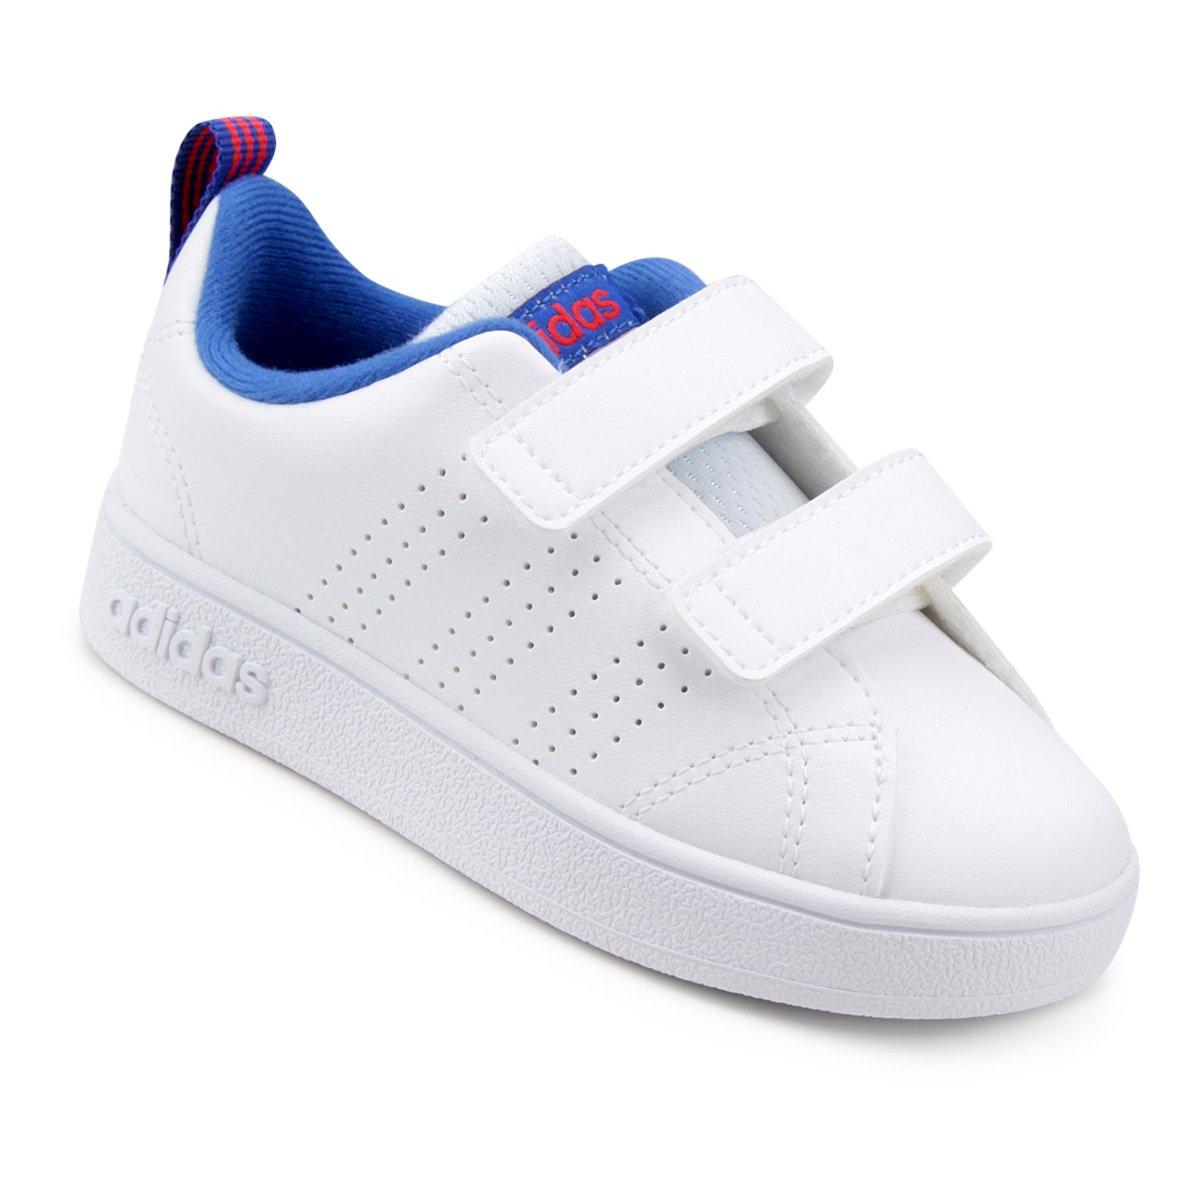 0055ad9bc Tênis Infantil Adidas Vs Advantage Clean Masculino